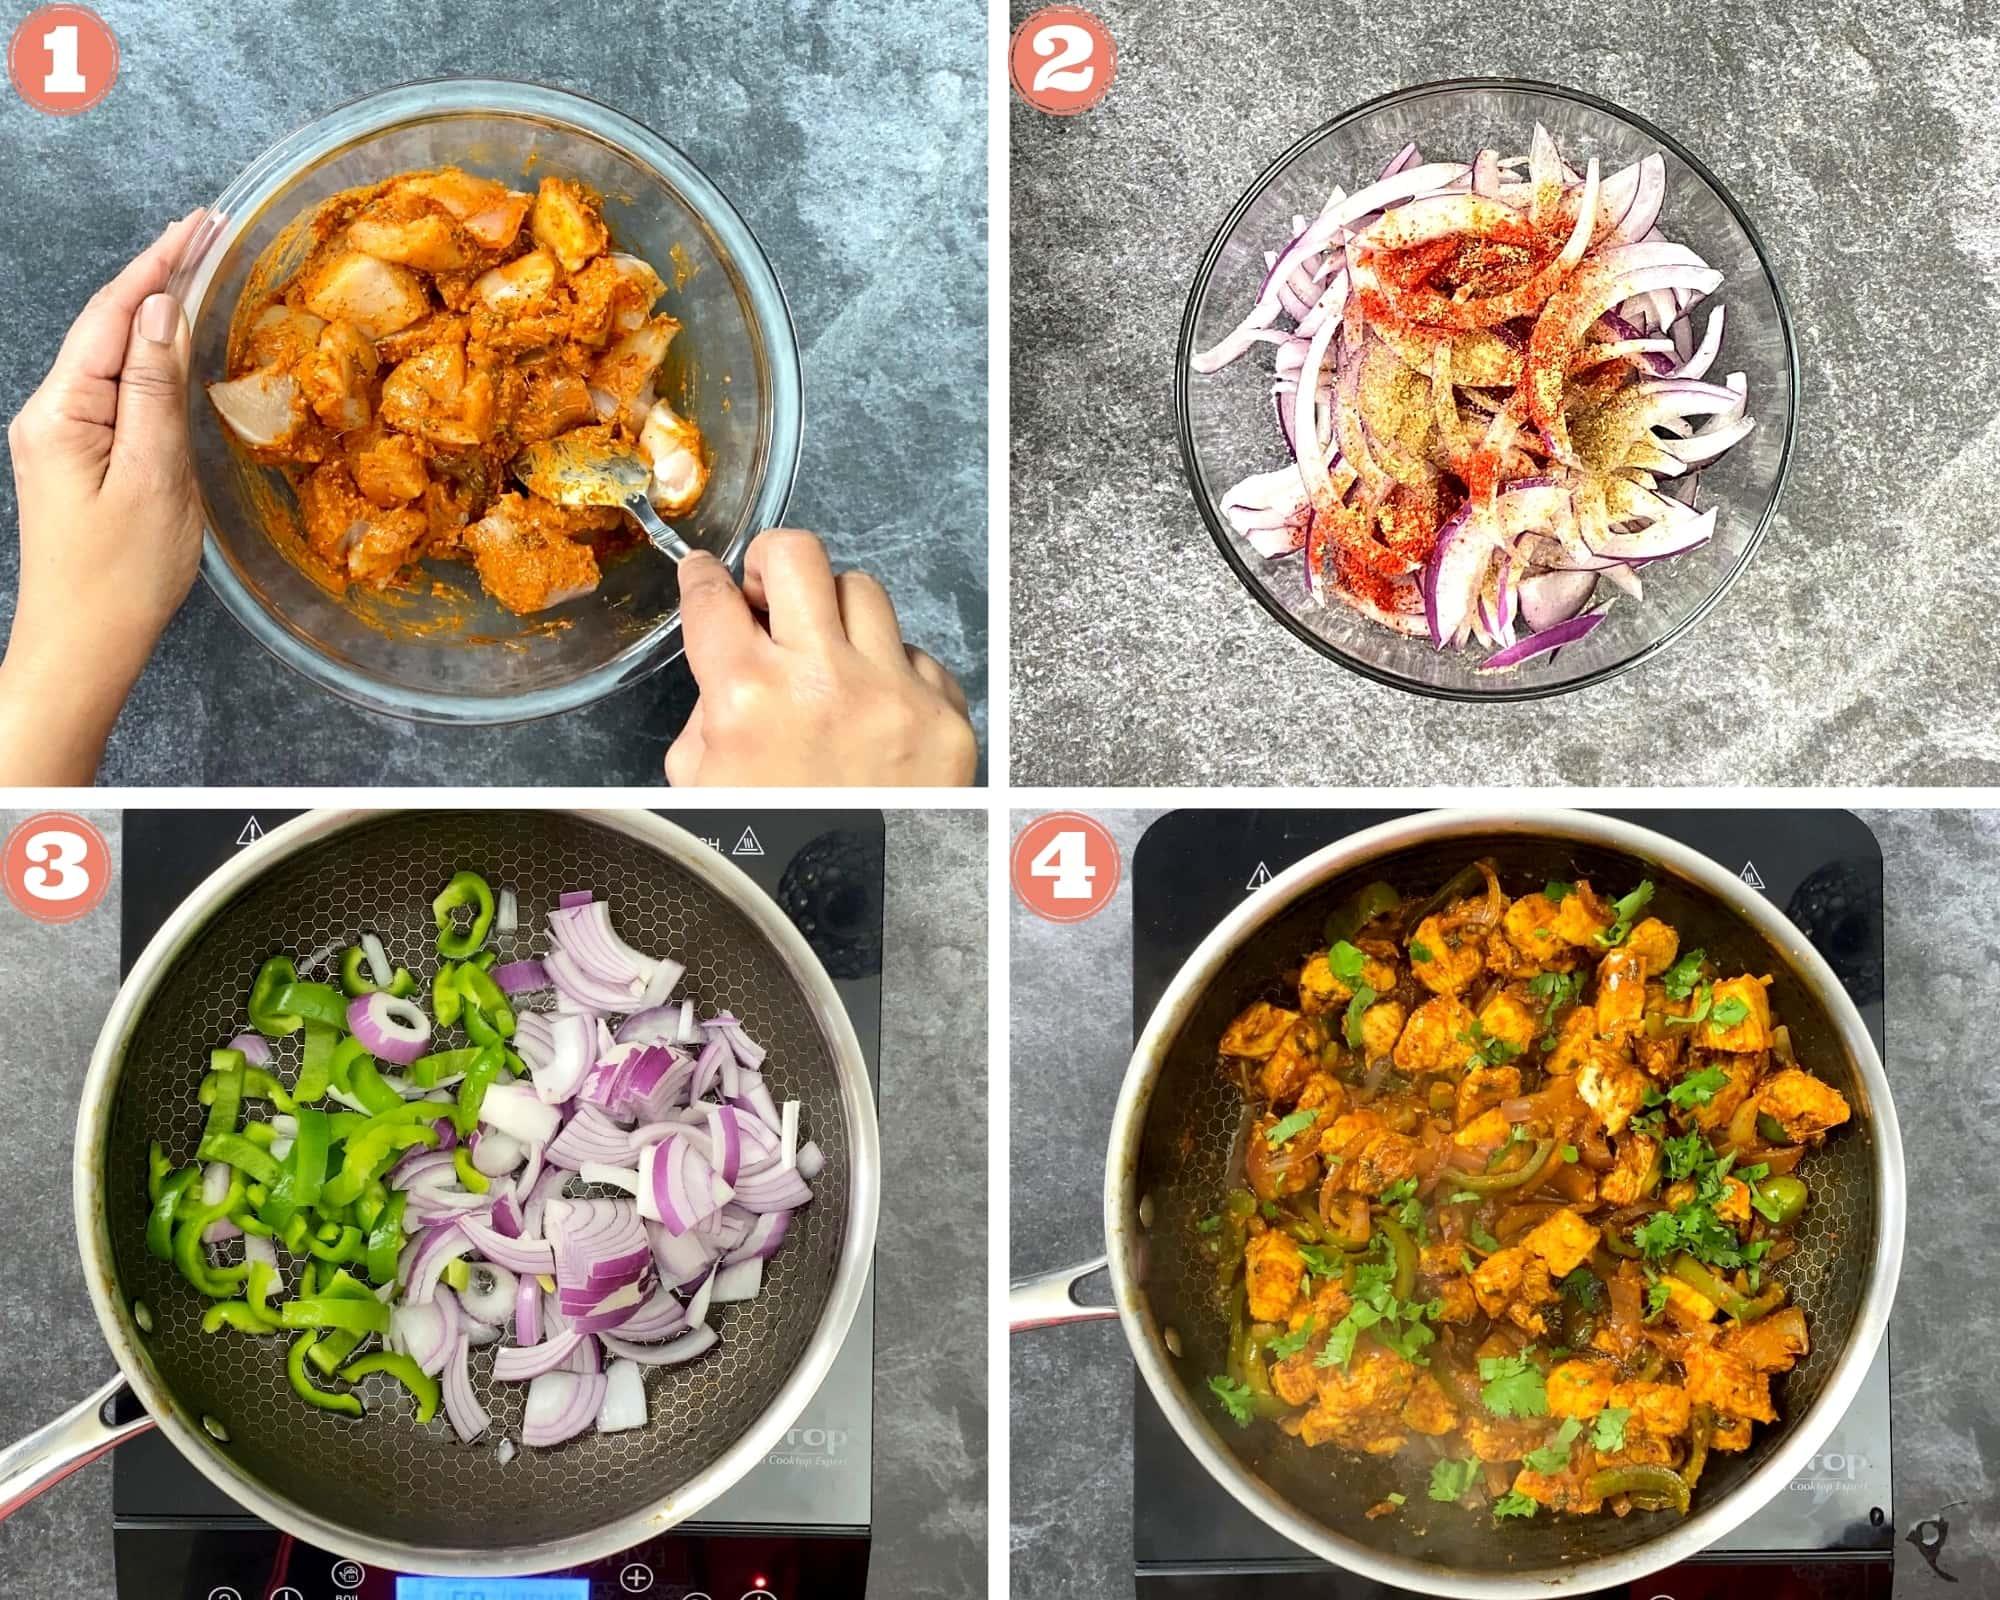 First 4 steps to make chicken kathi rolls